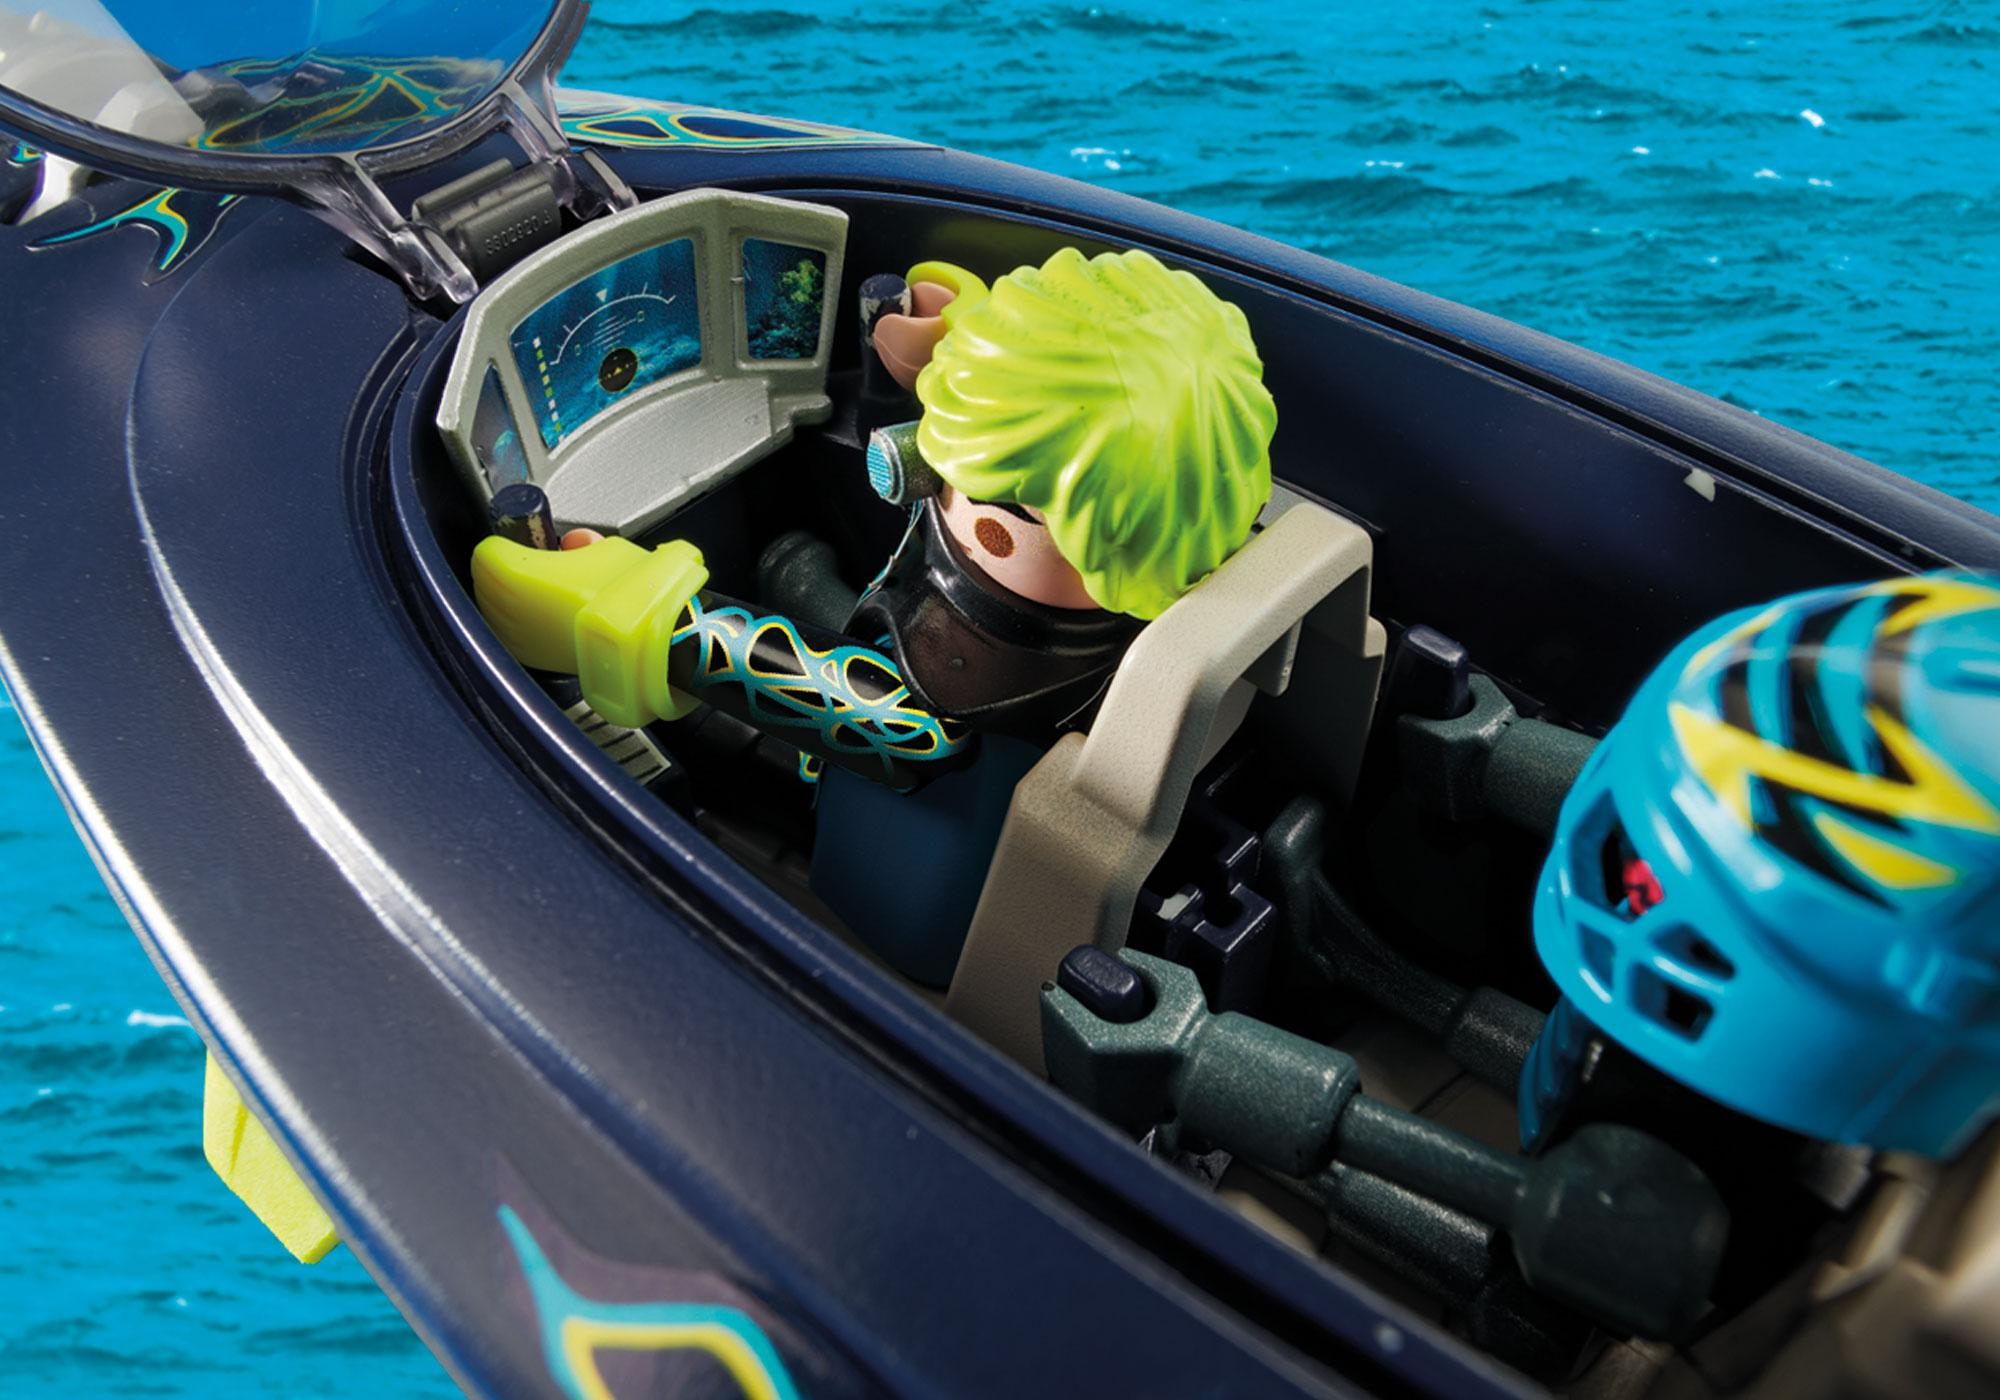 http://media.playmobil.com/i/playmobil/70005_product_extra3/TEAM S.H.A.R.K. Drill Destroyer